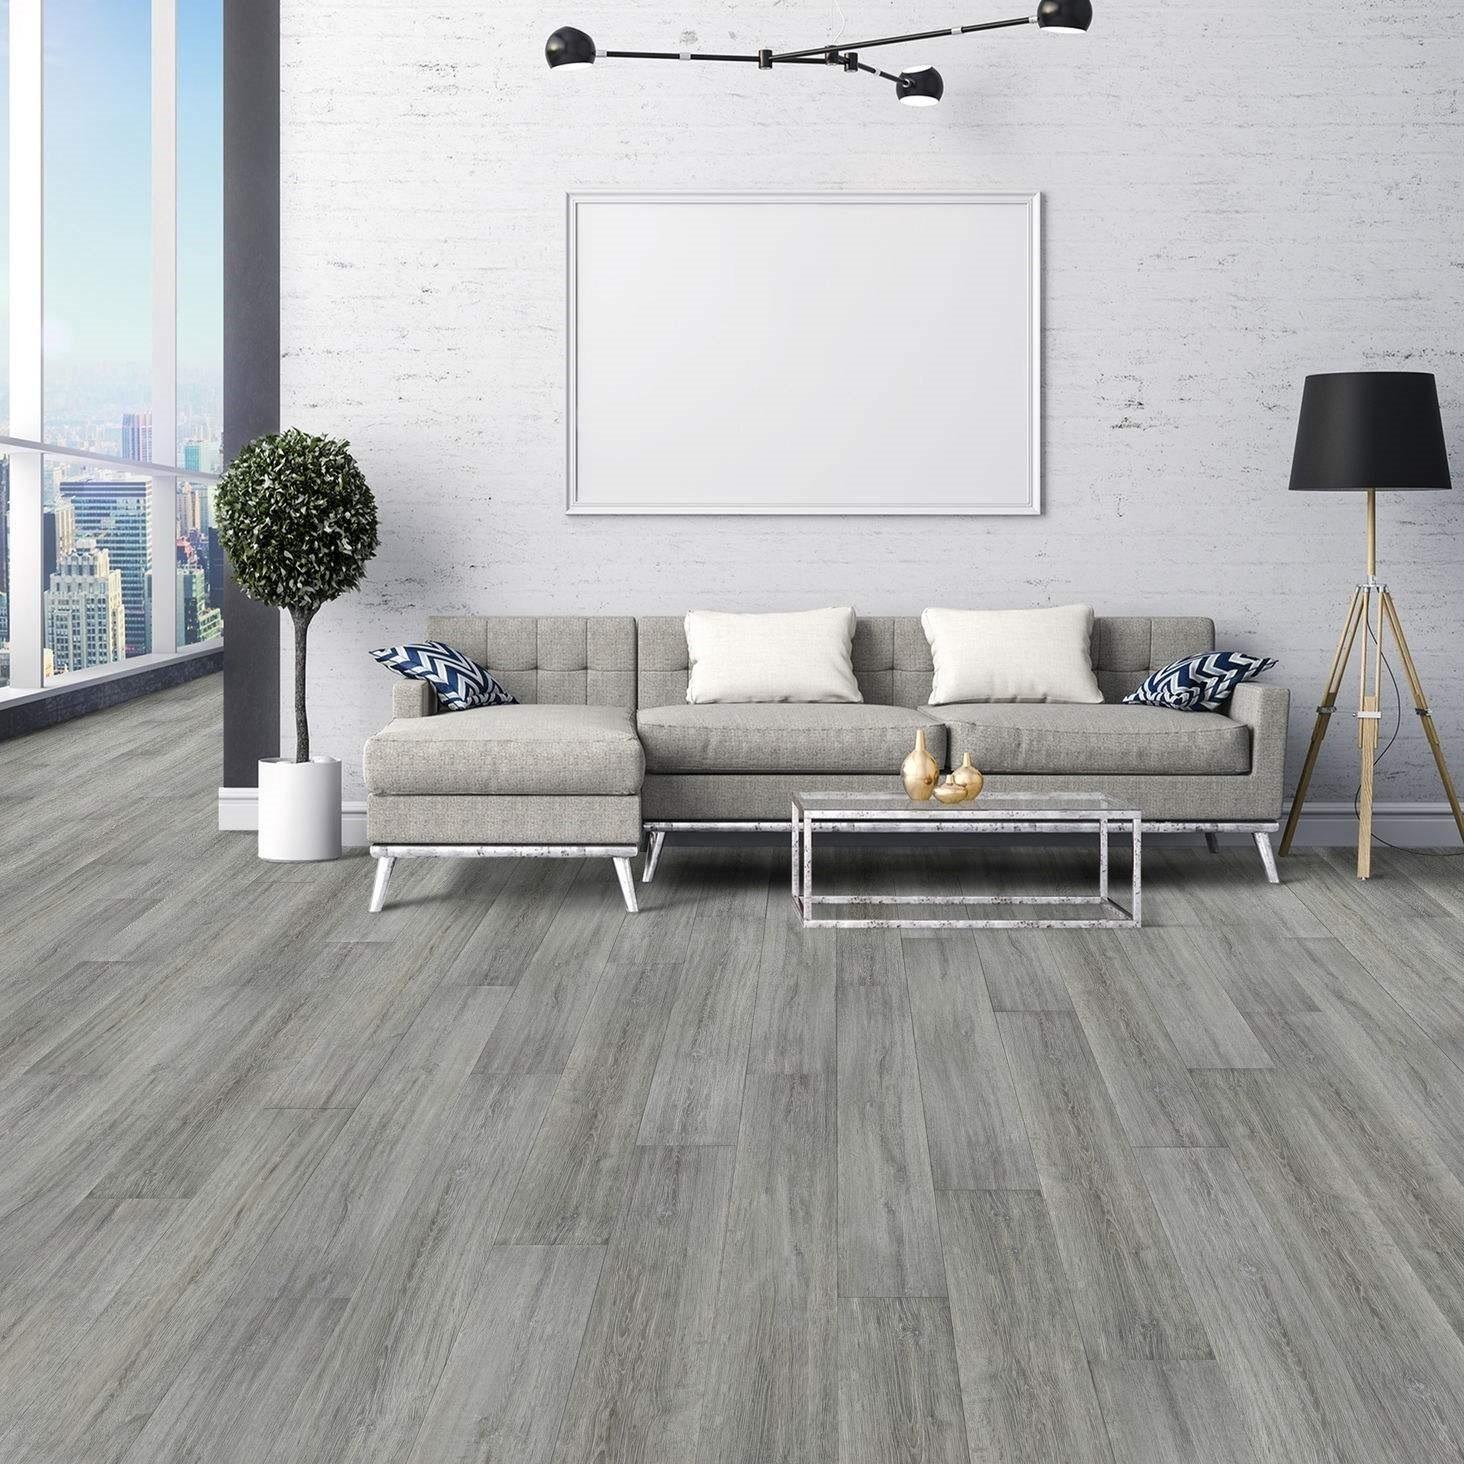 China 4mm Waterproof Lifeproof Acacia Luxury Vinyl Plank Flooring China Laminate Flooring On Walls Laminate Flooring Prices